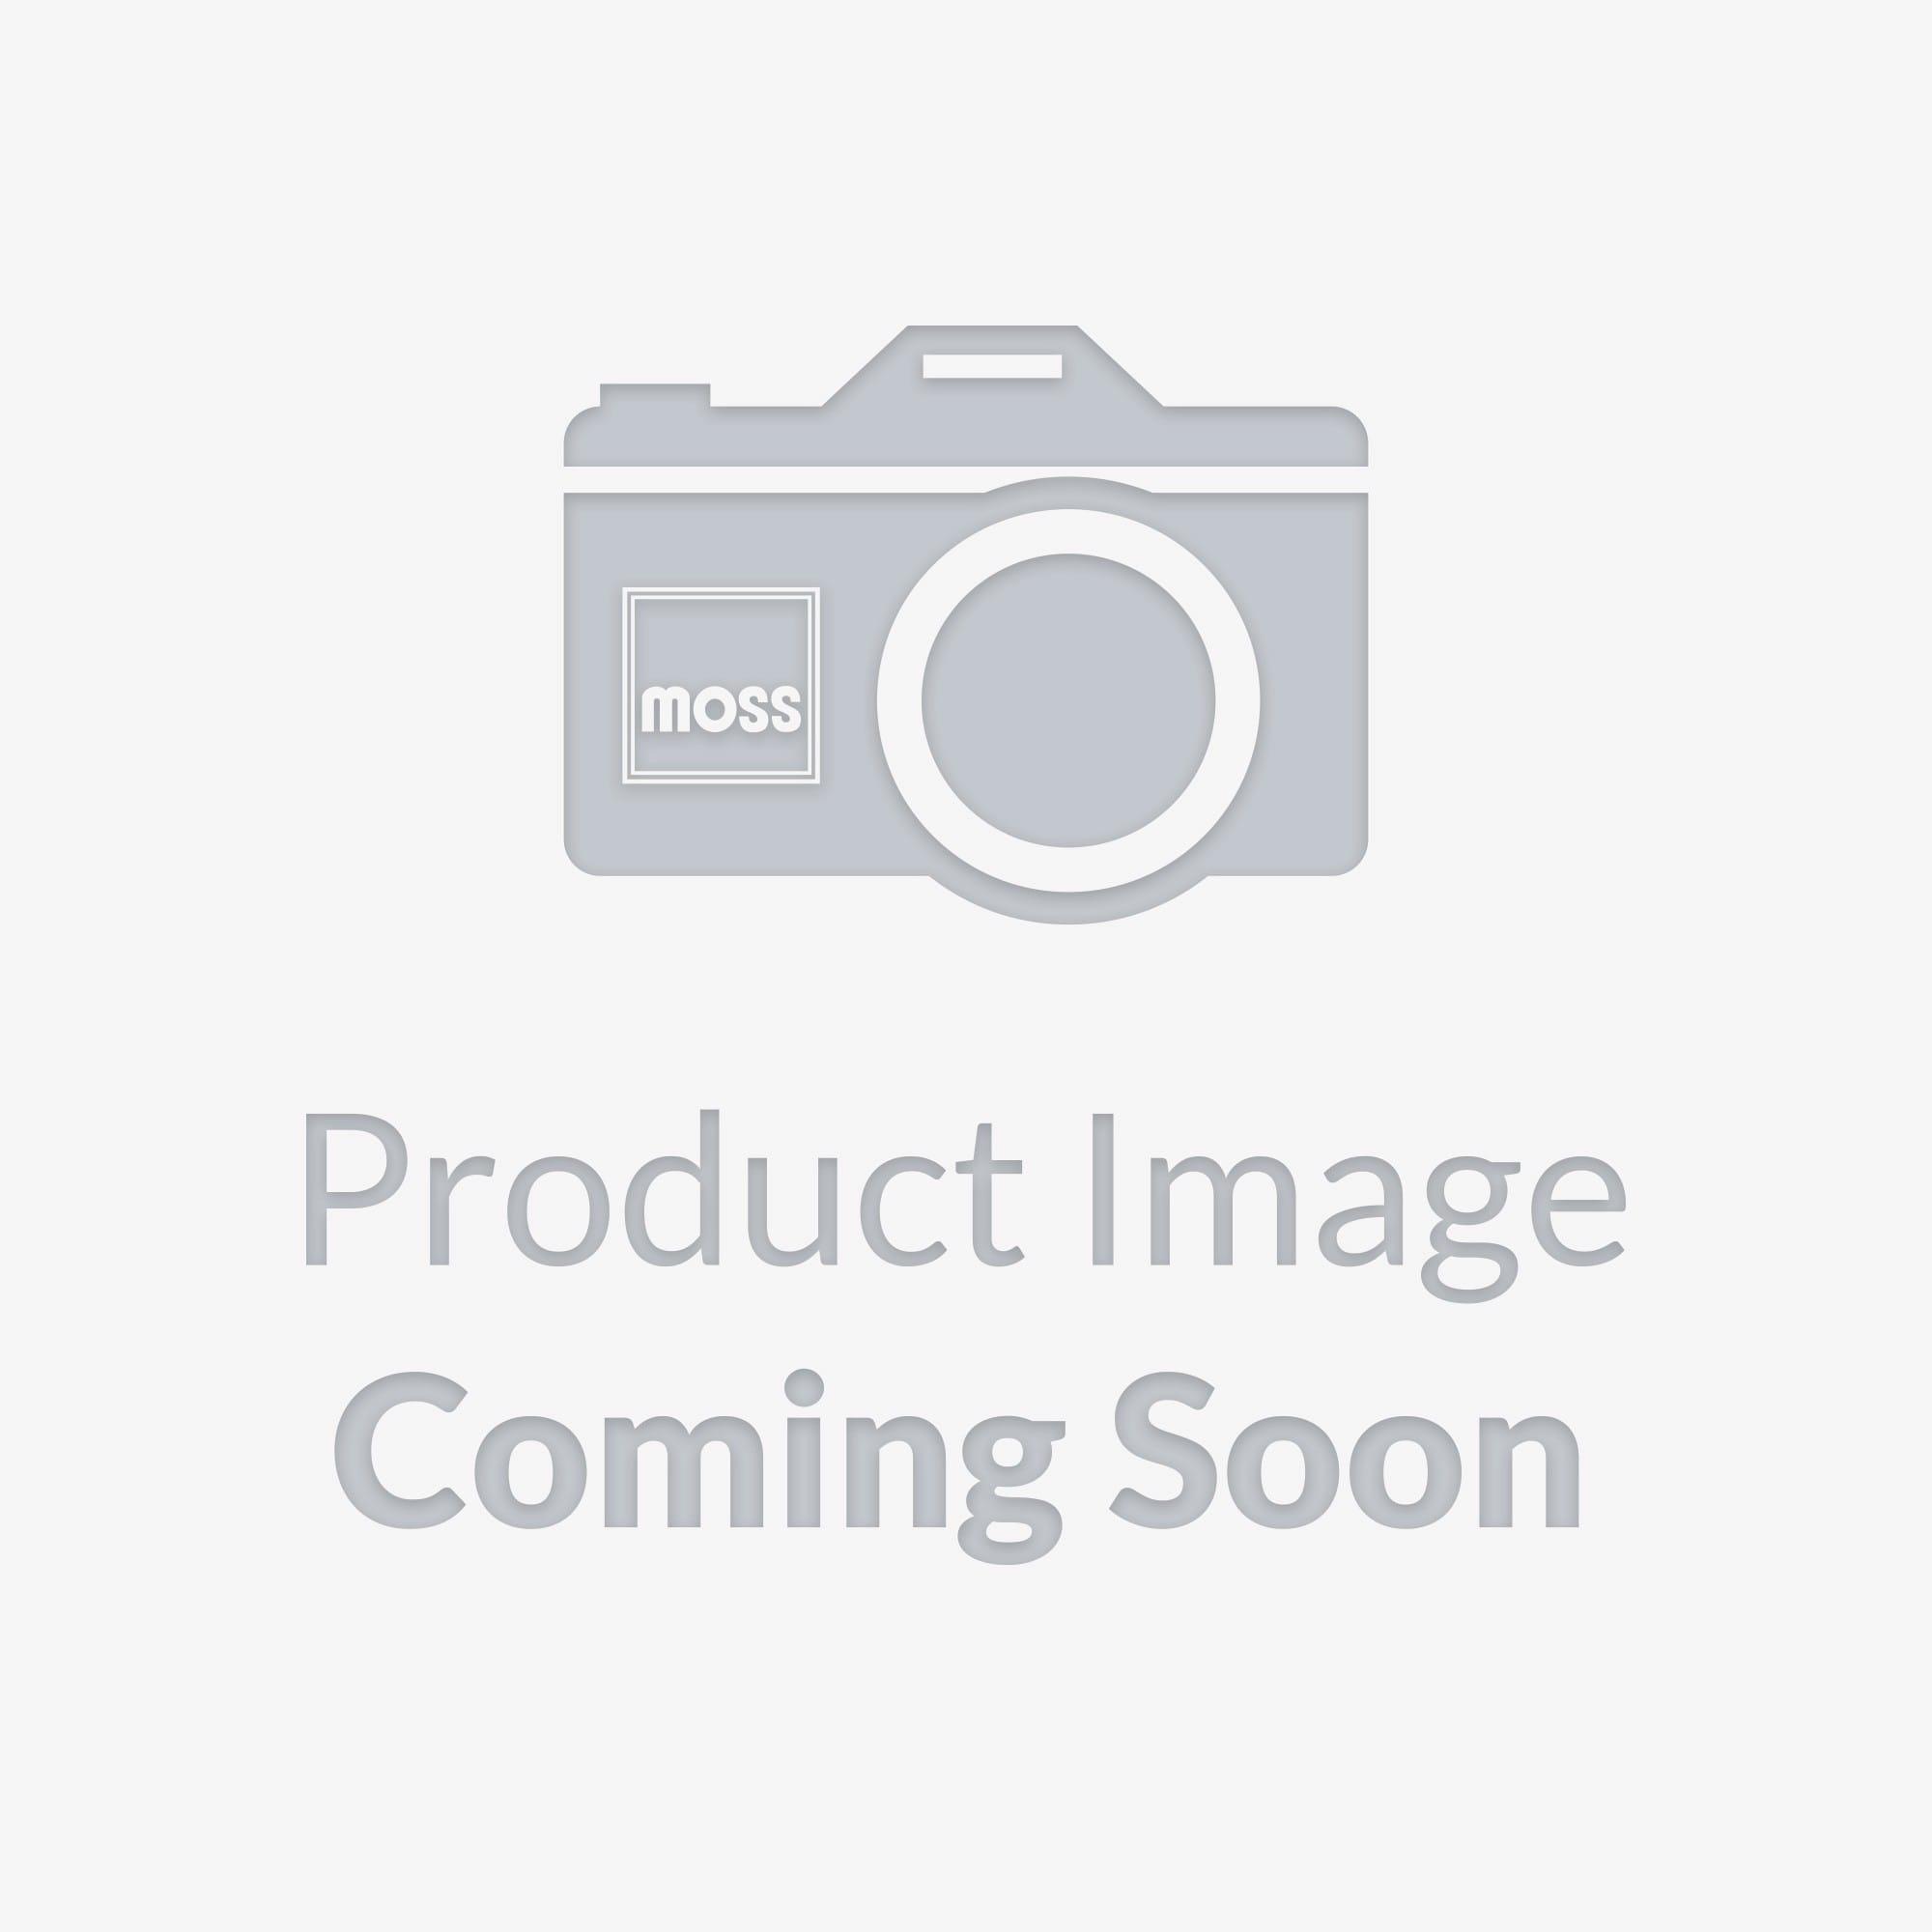 Pro Flo Long Center Branch Exhaust Manifold (Header